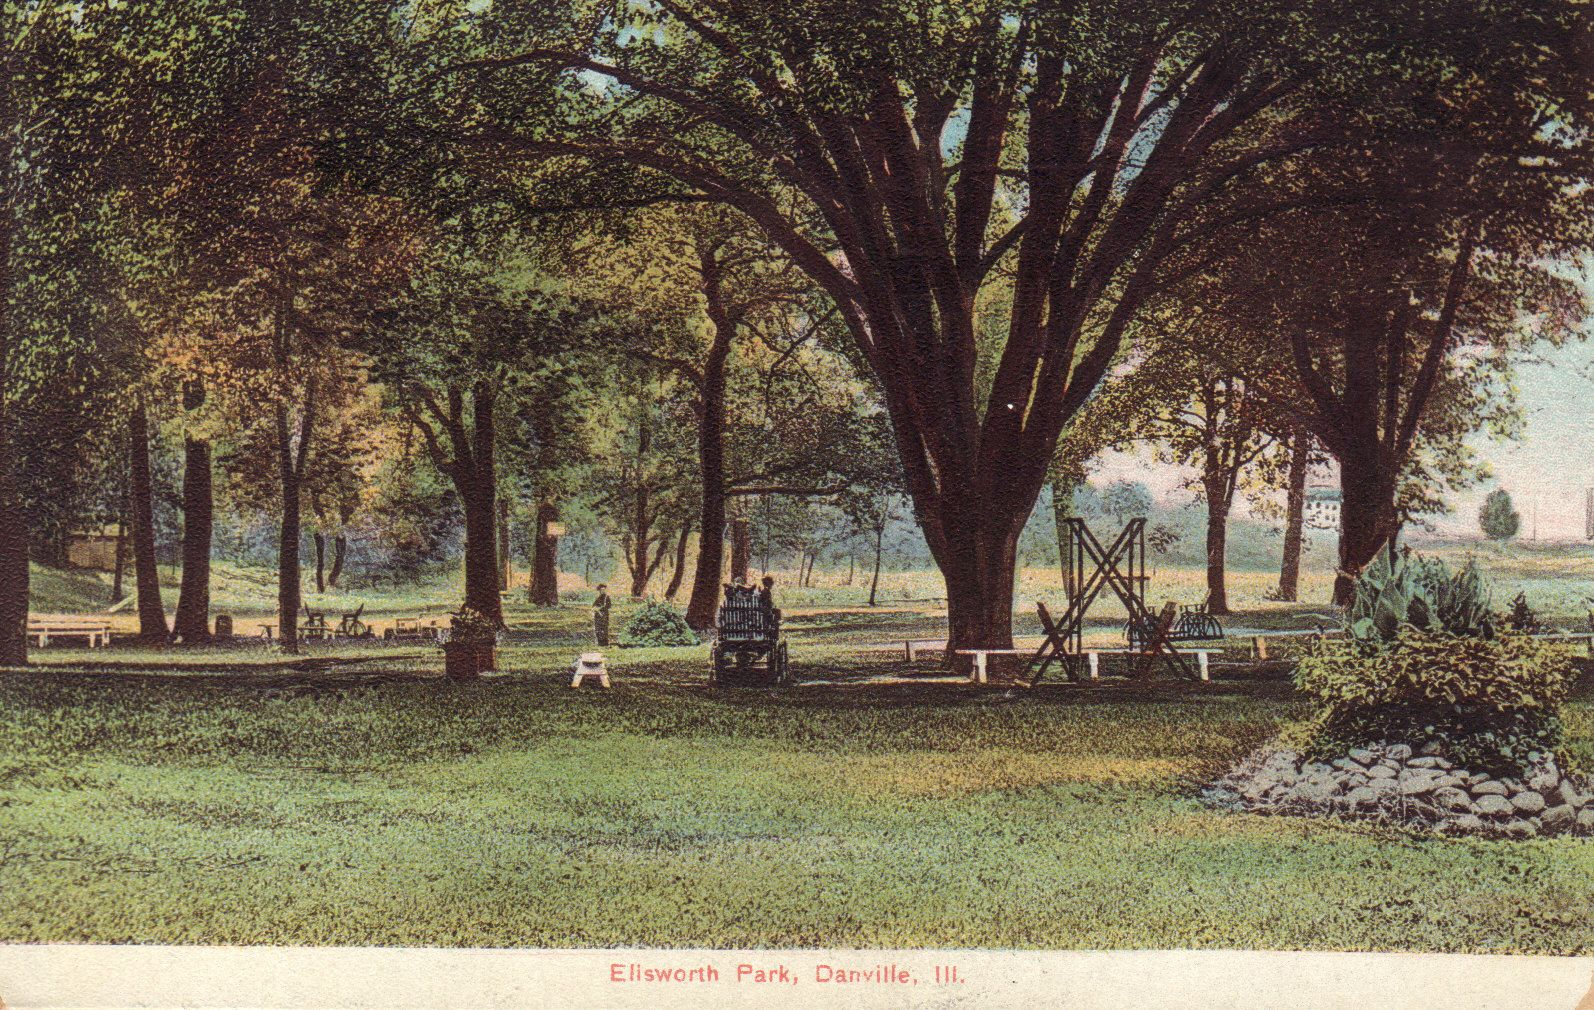 Ellsworth Park, Danville, Ill.   Danville, IL Postcards   Pinterest ...